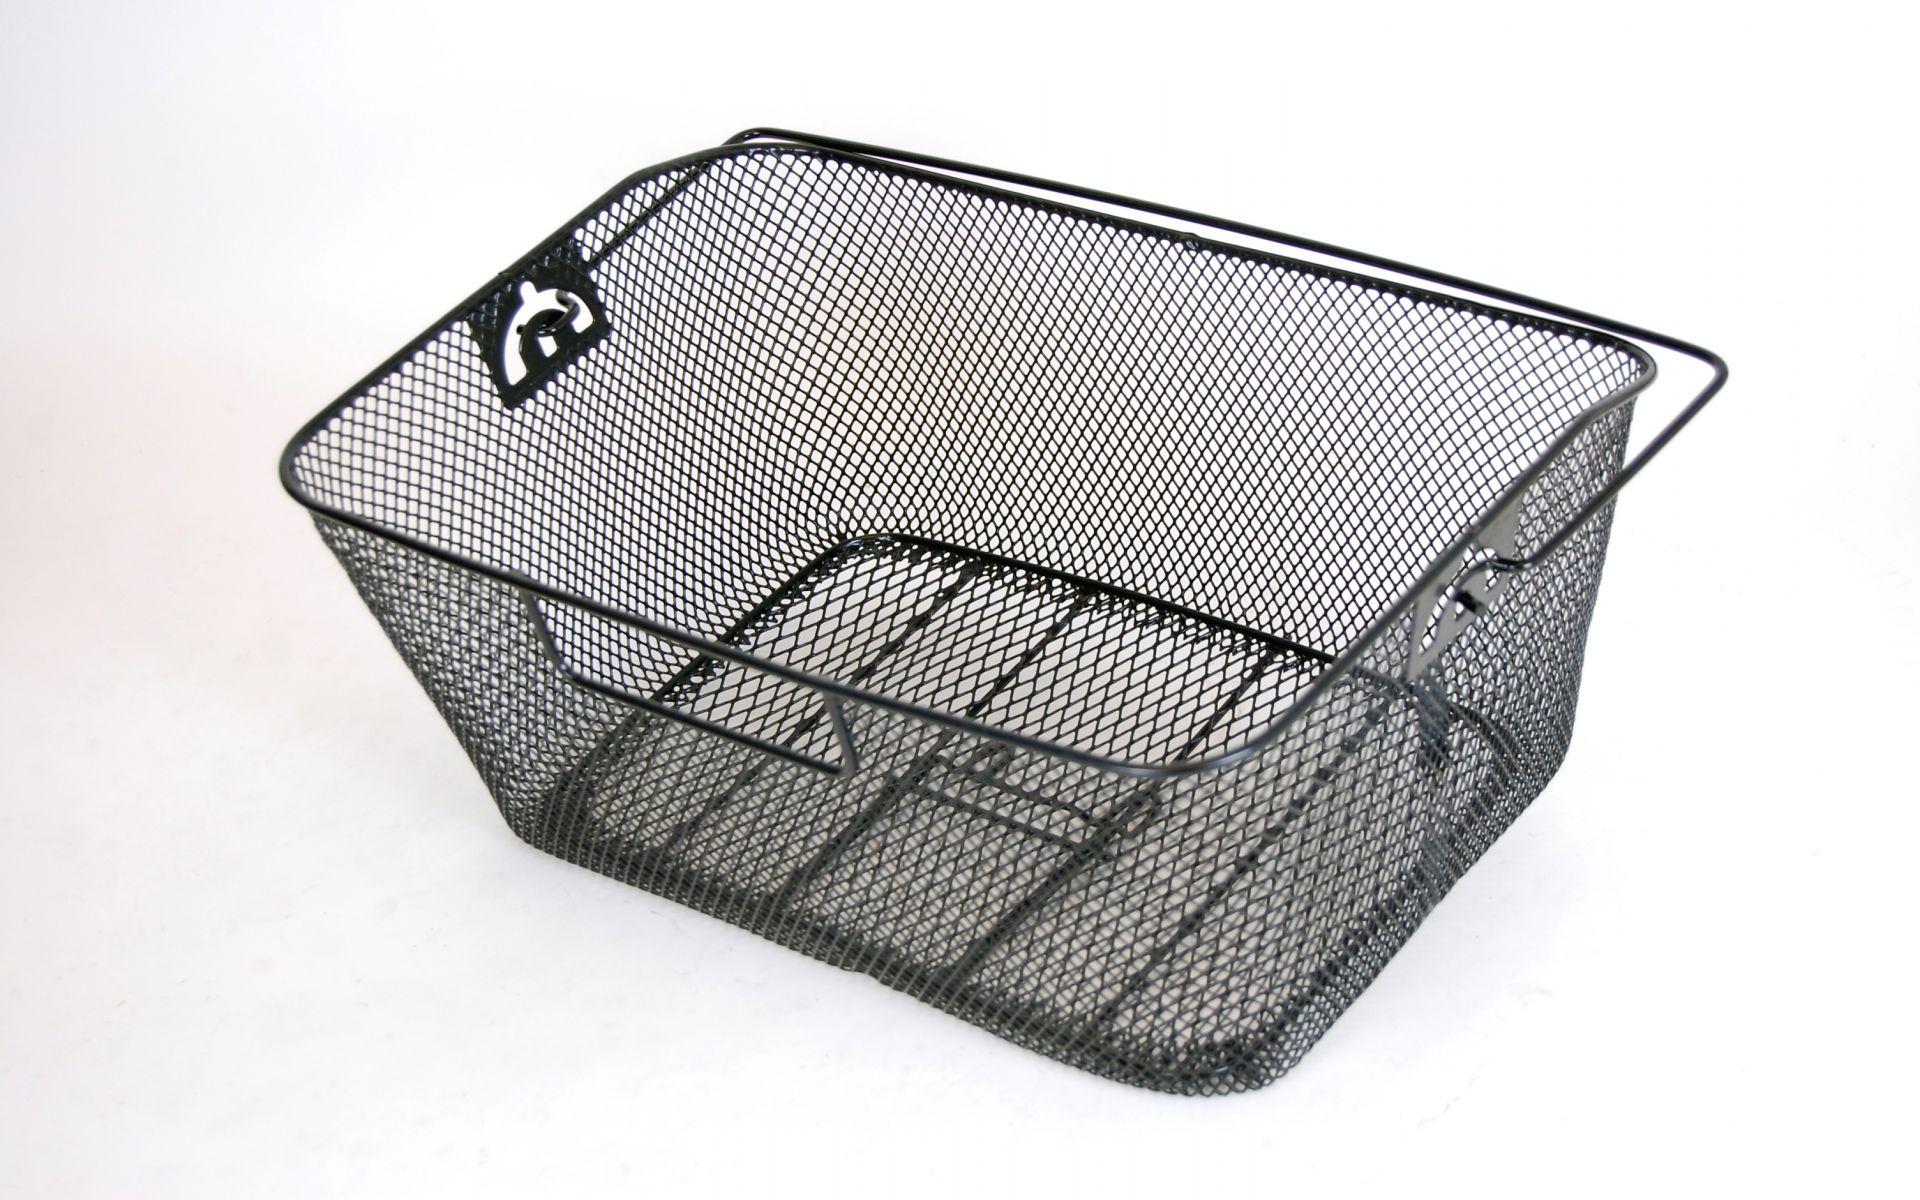 Kurv Bag Net Sort L40 x B30 x H18-15 cm (10)